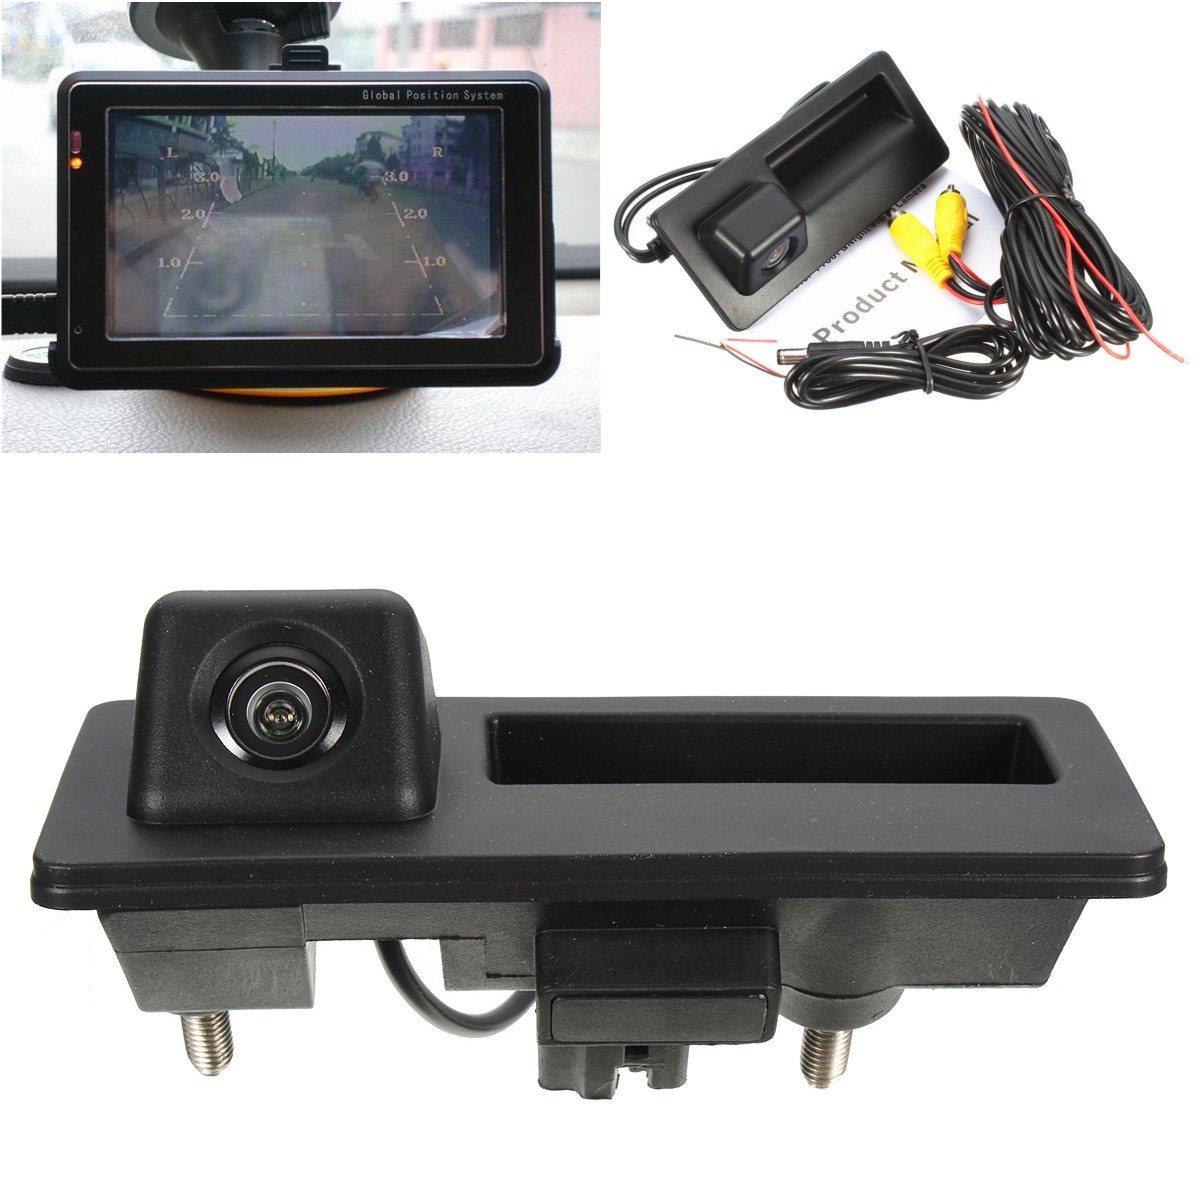 Caliente cámaras de visión trasera del coche que invierte la cámara reversa para VW/JETTA/TIGUAN/RCD510/RNS315/RNS310 /RNS510